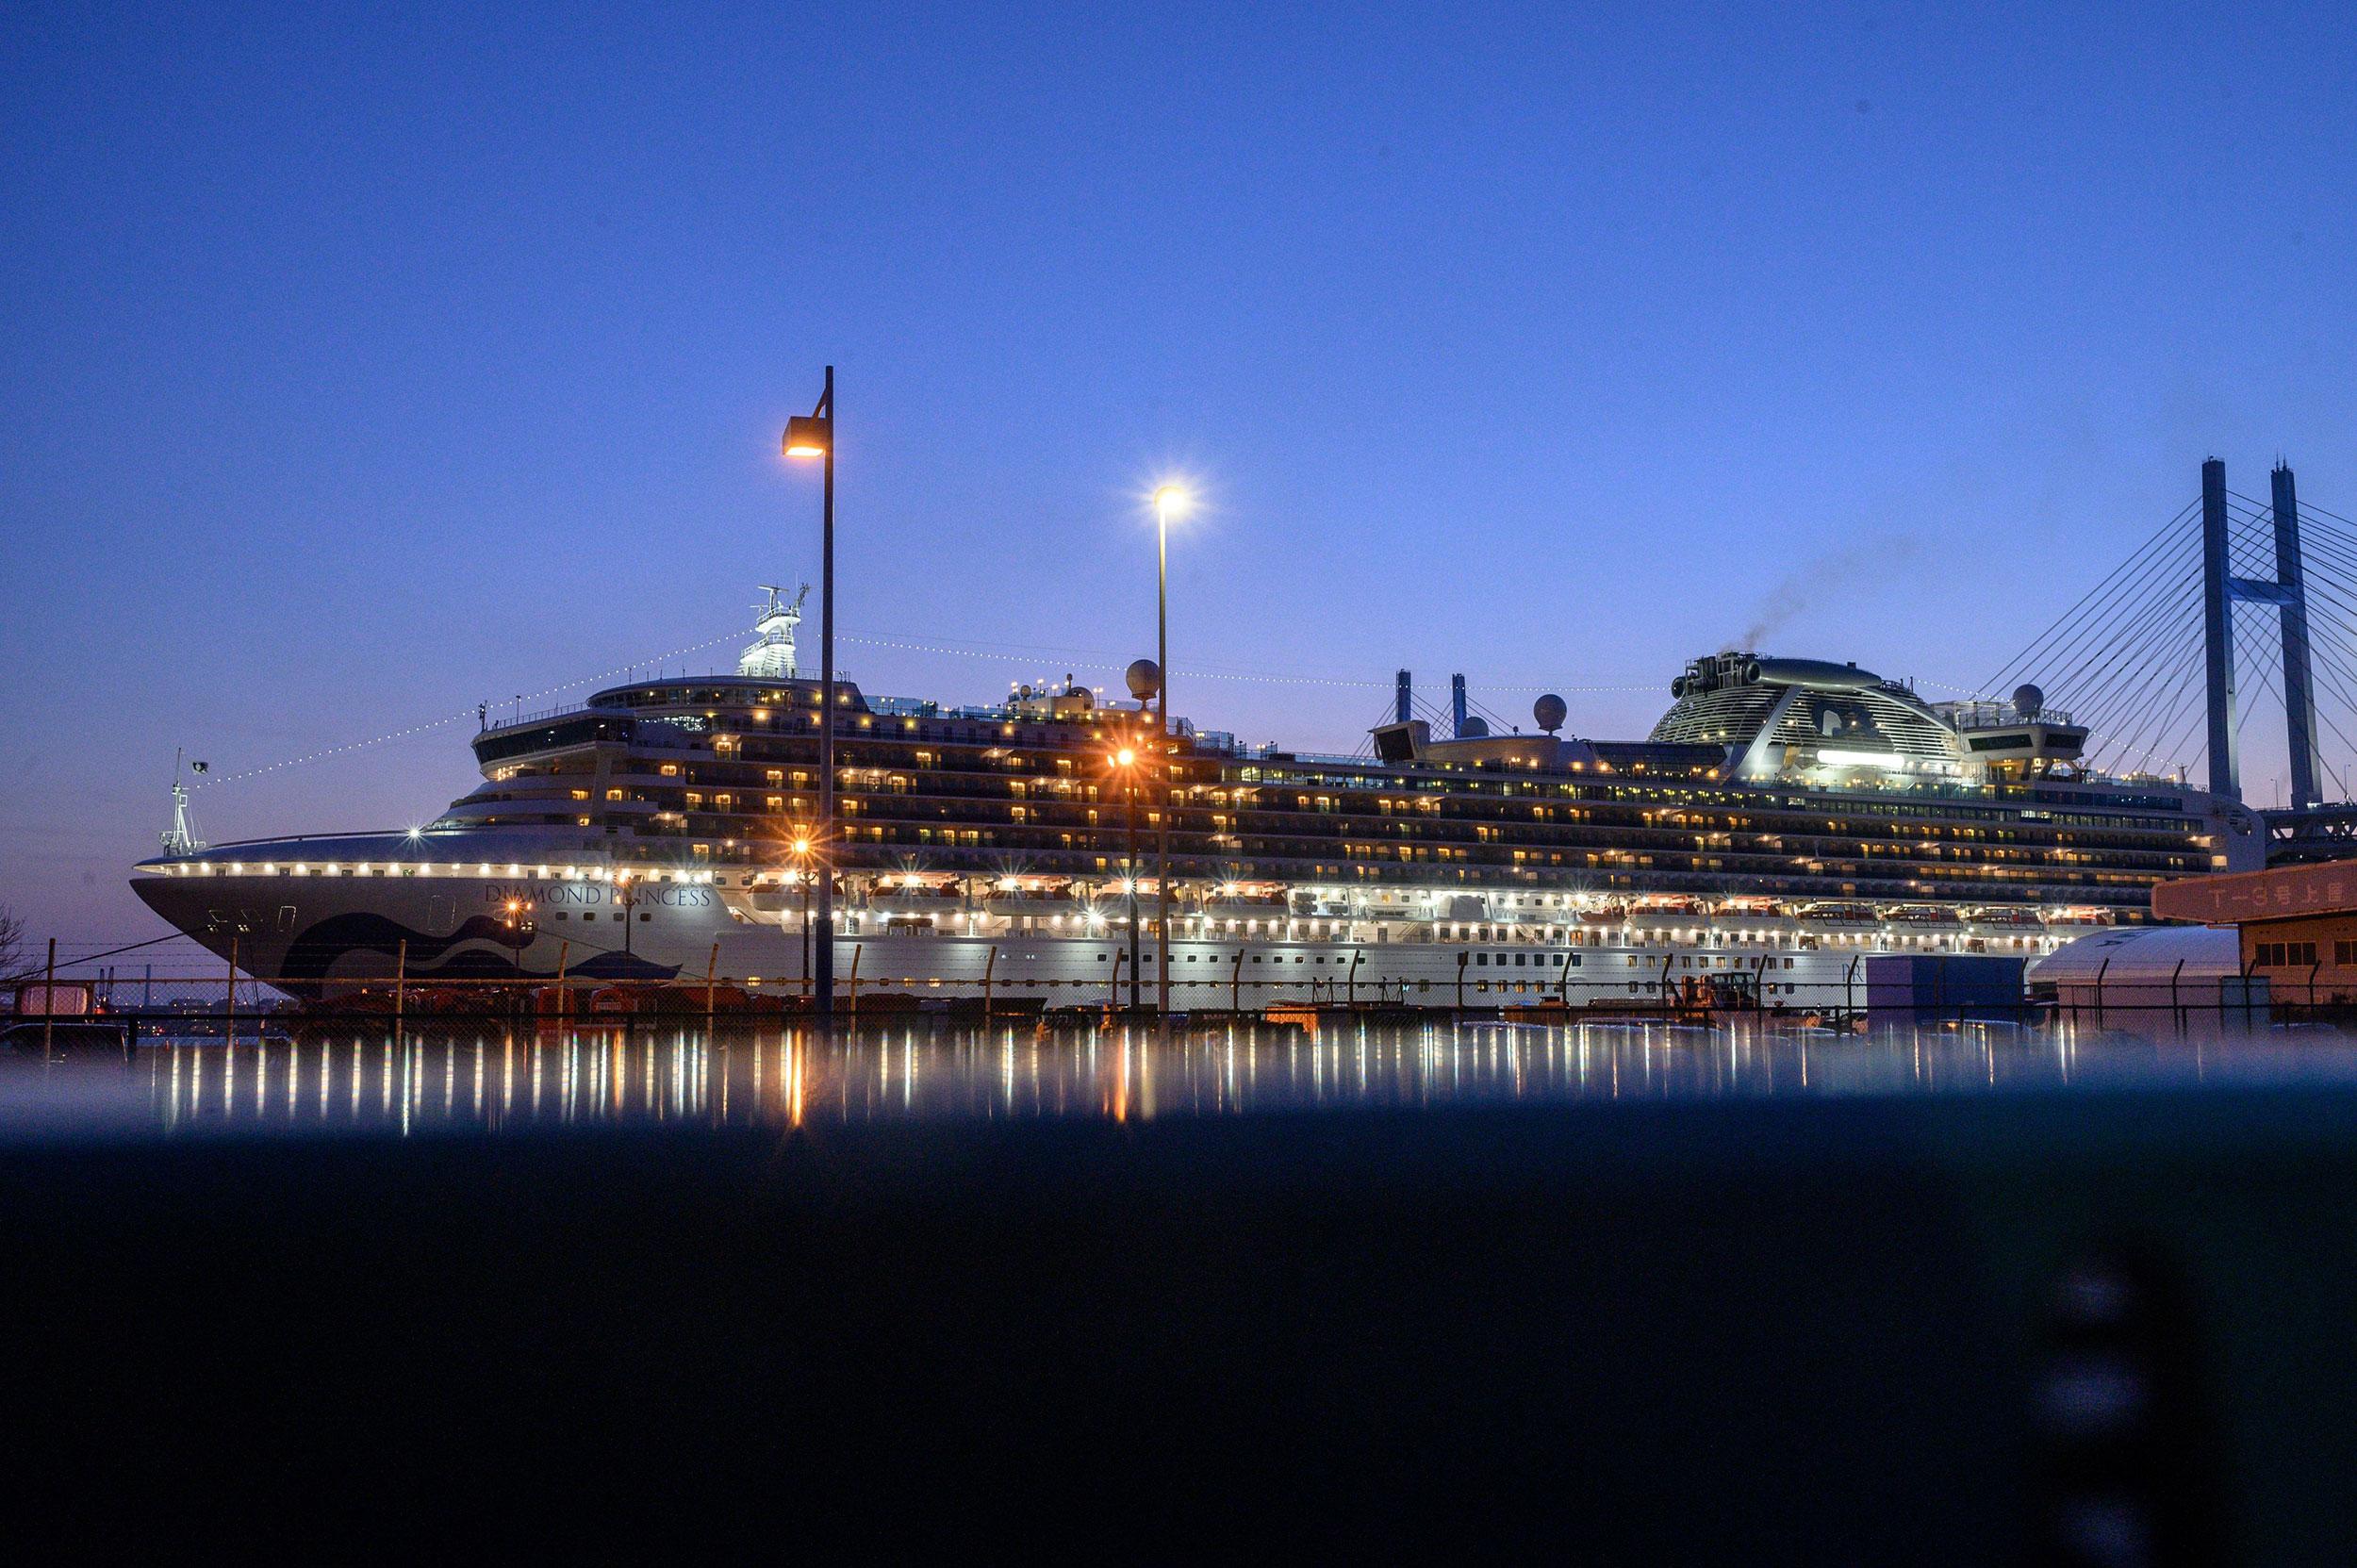 The Diamond Princess cruise ship docked in Yokohama, Japan, on February 24.